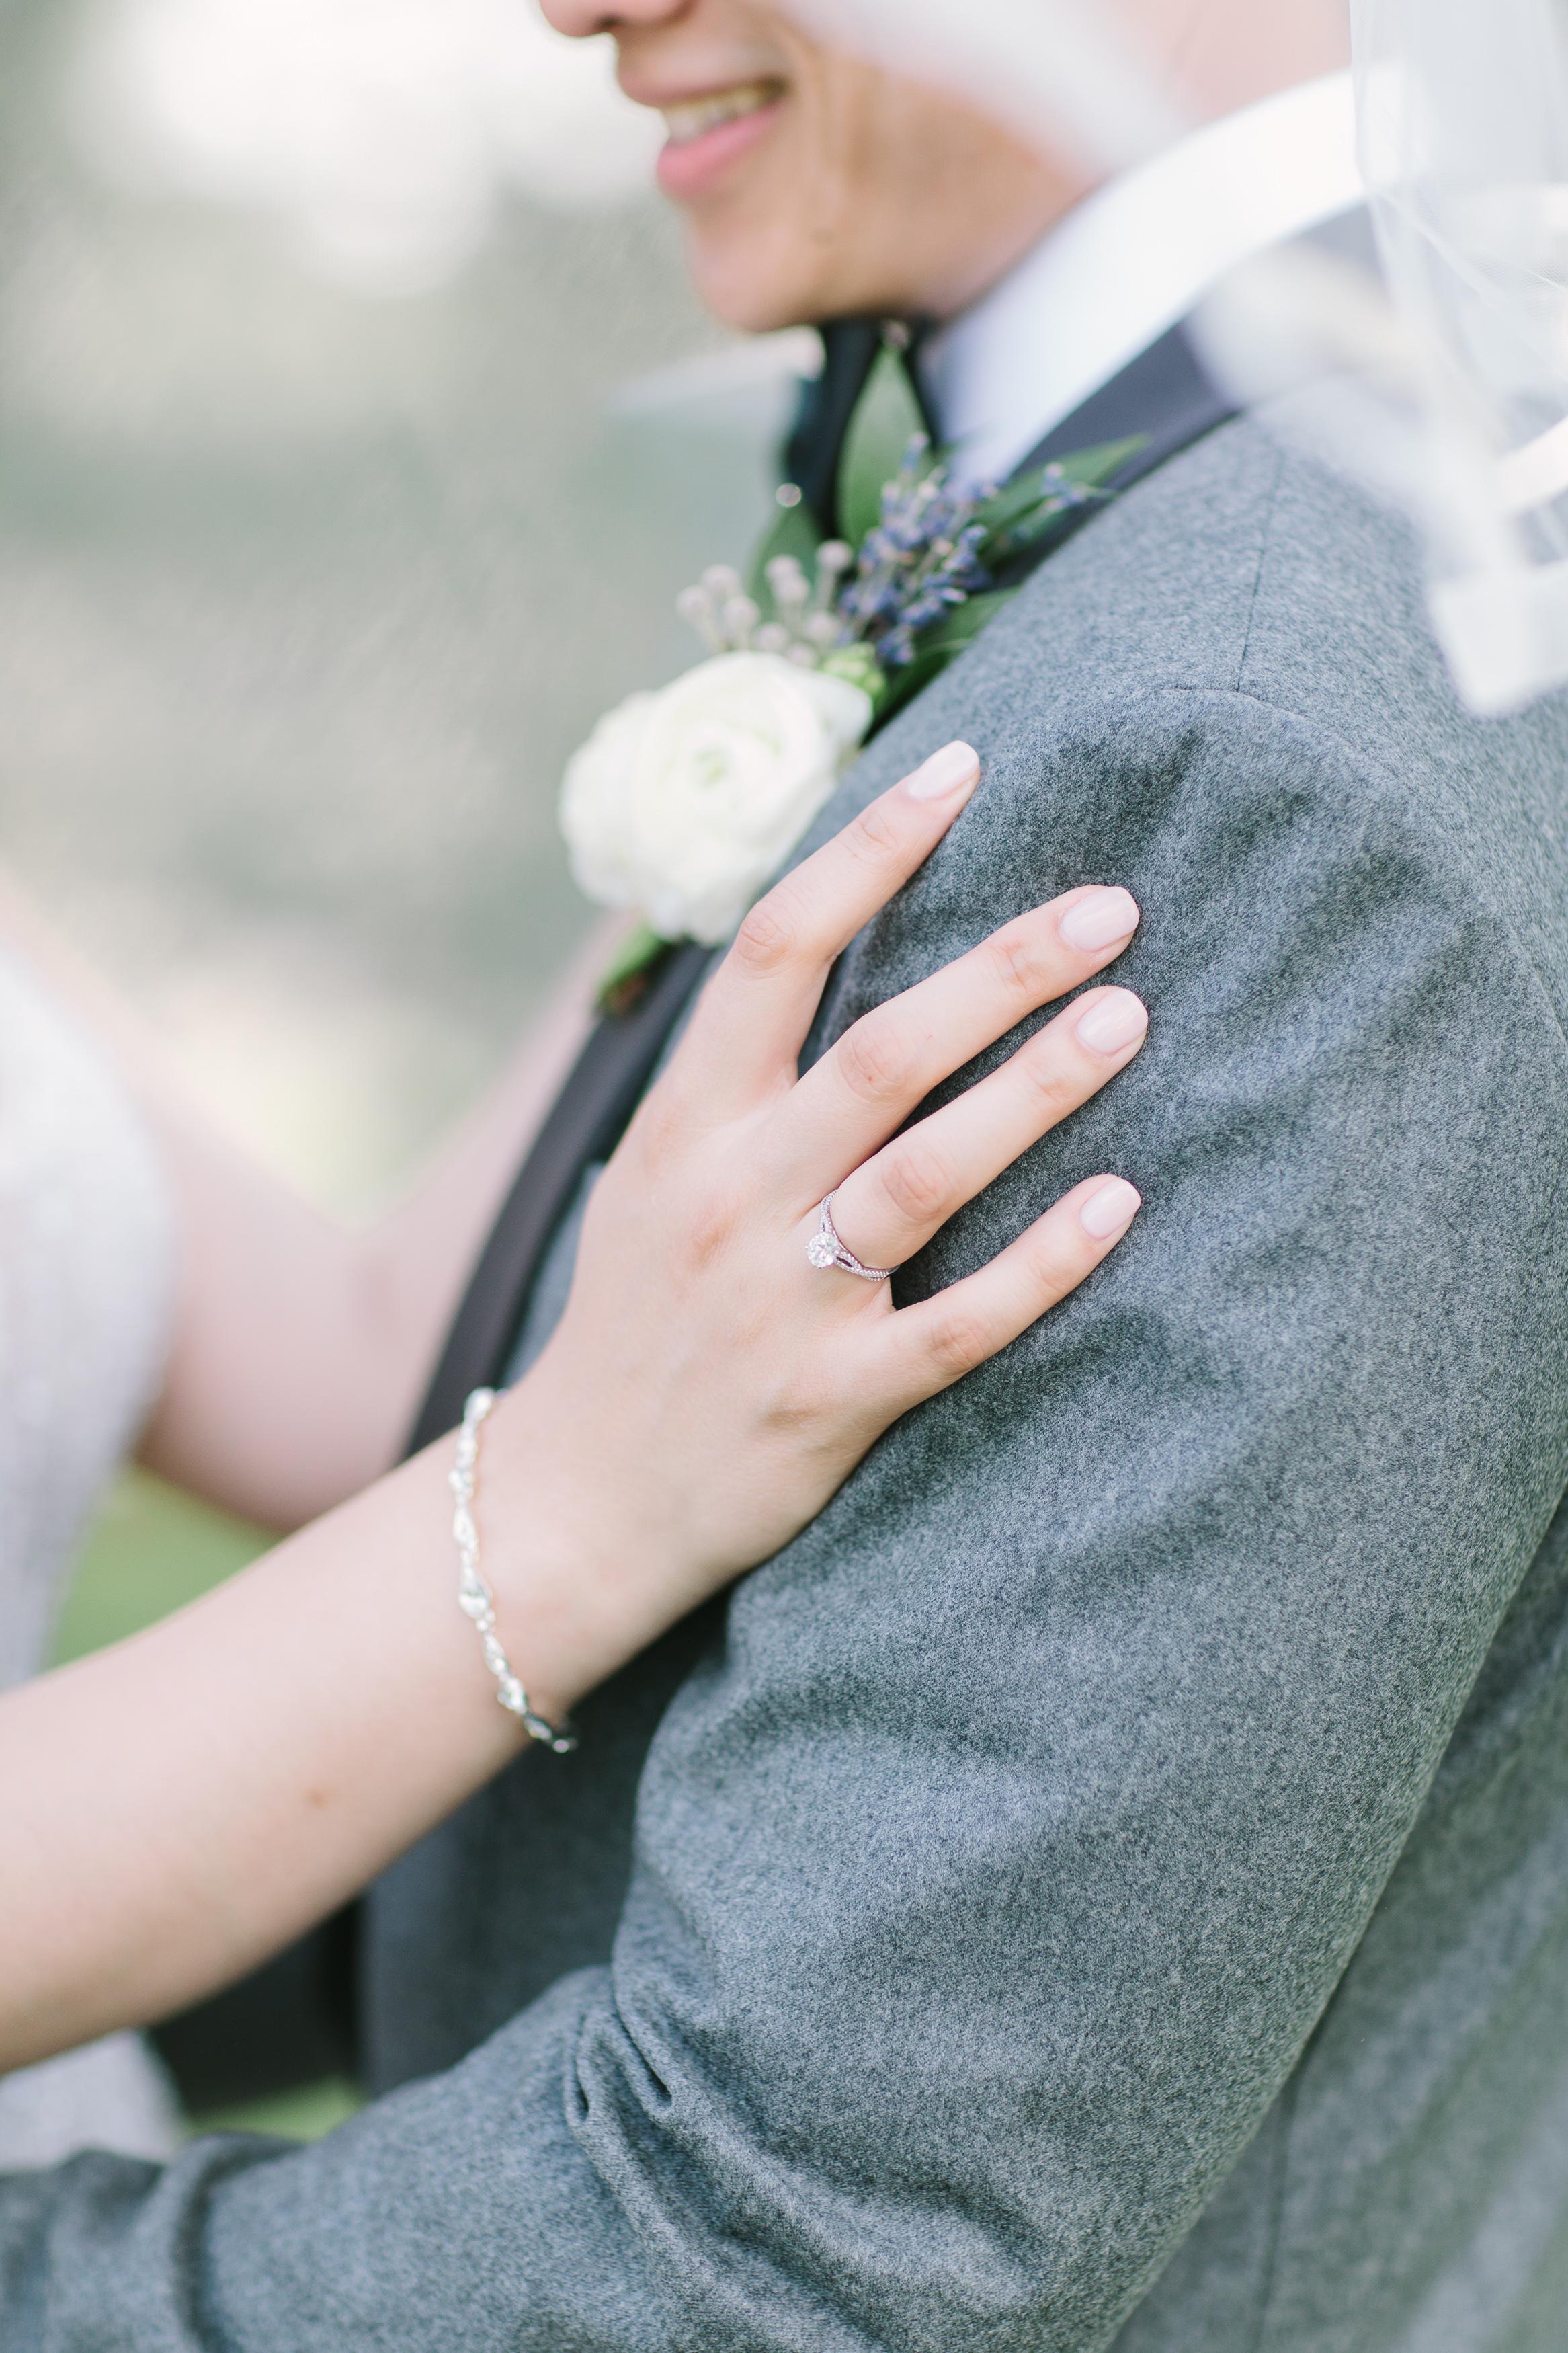 Nicodem Creative_Blog_Leung Wedding_The Pavilion at Orchad Ridge Farms_Rockton Illinois-50.jpg